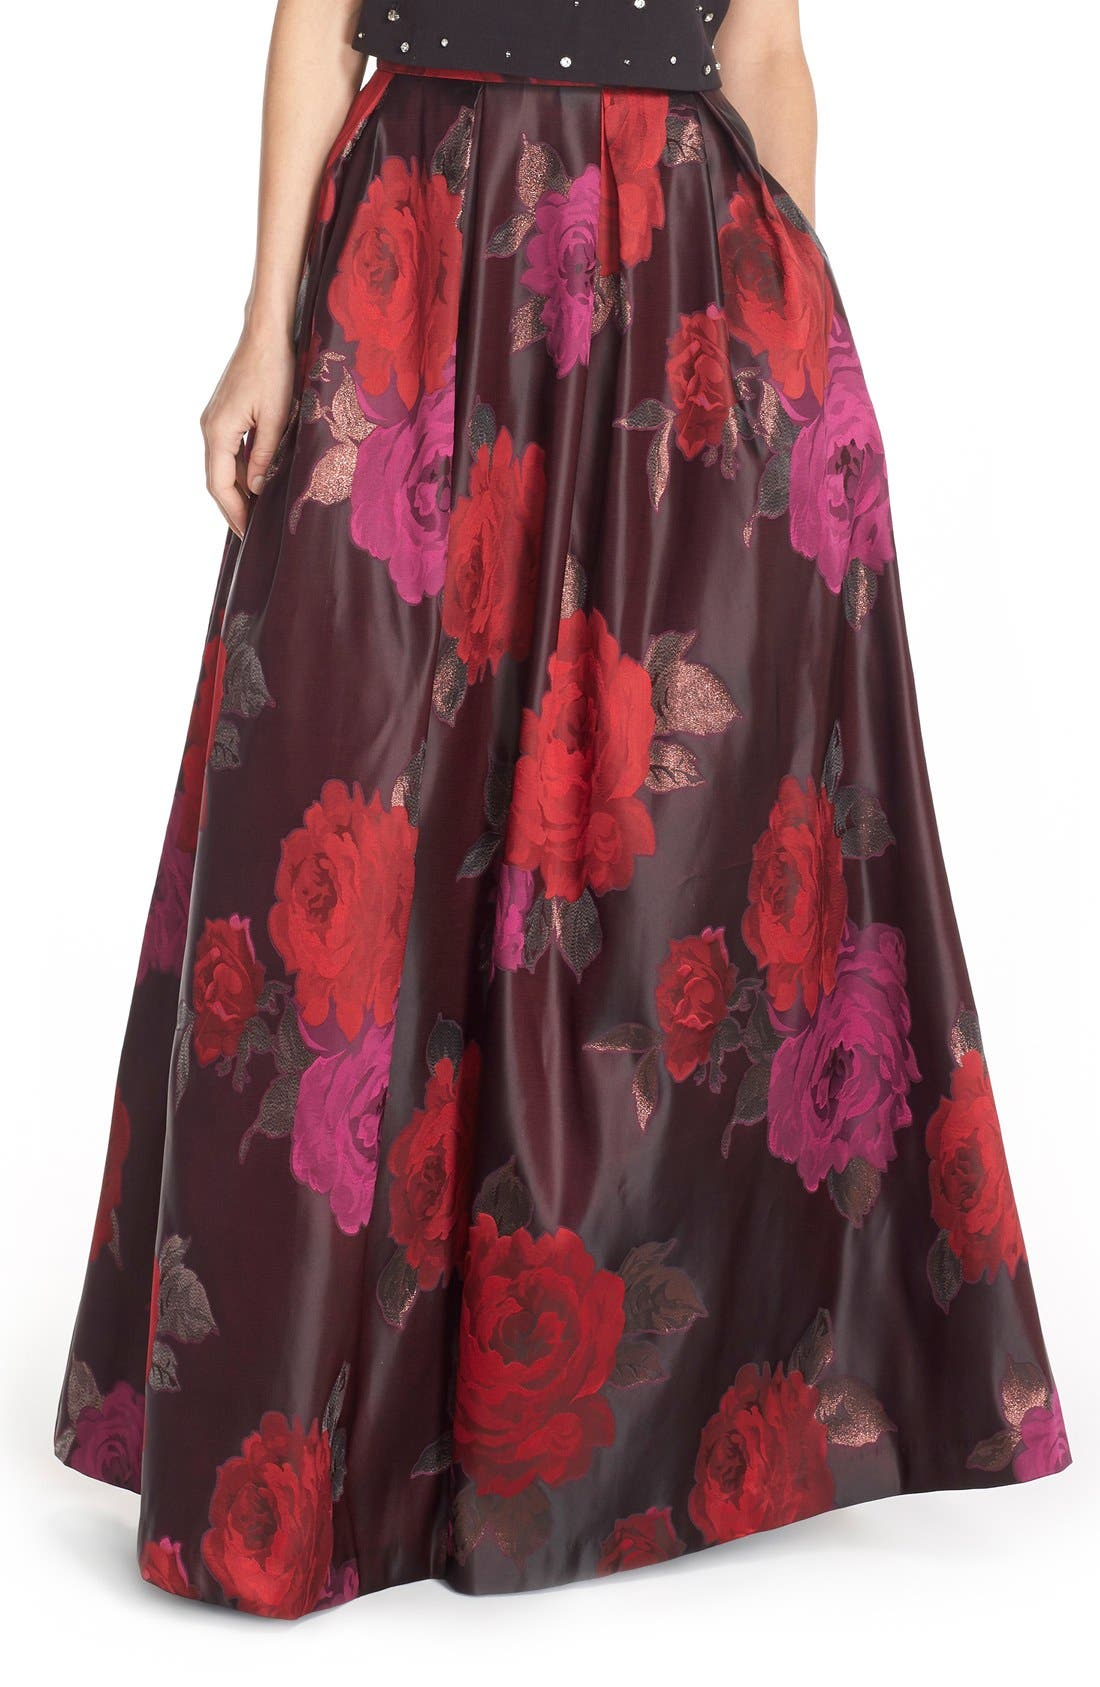 Alternate Image 1 Selected - Eliza J Floral Jacquard Ball Skirt